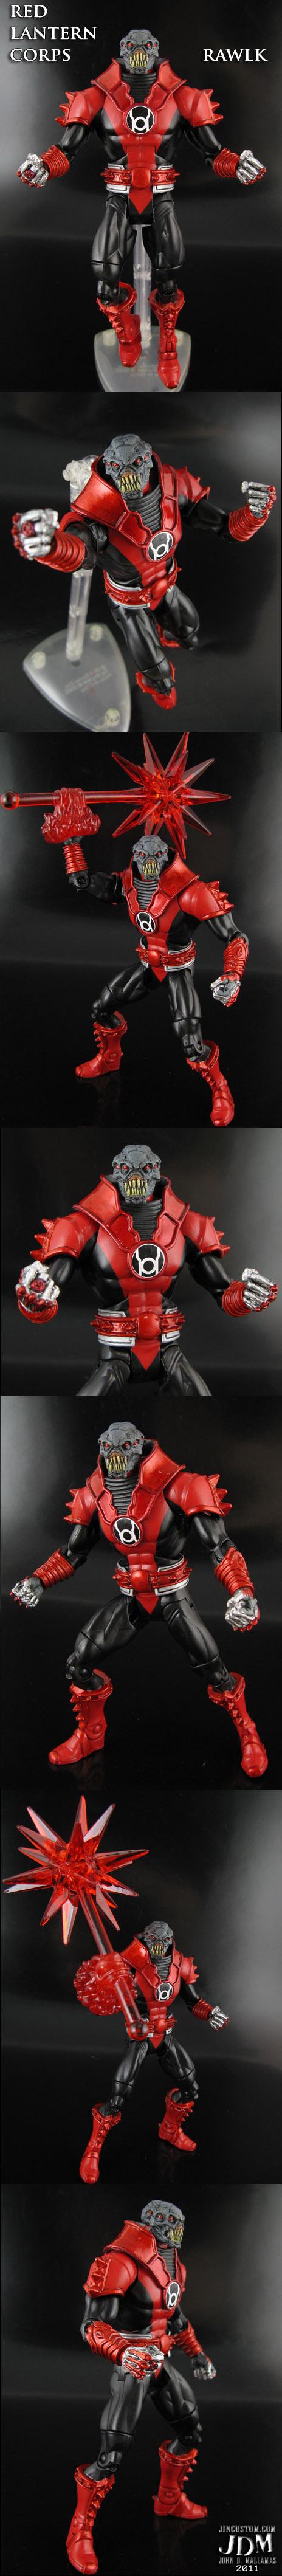 Custom Red Lantern Figure